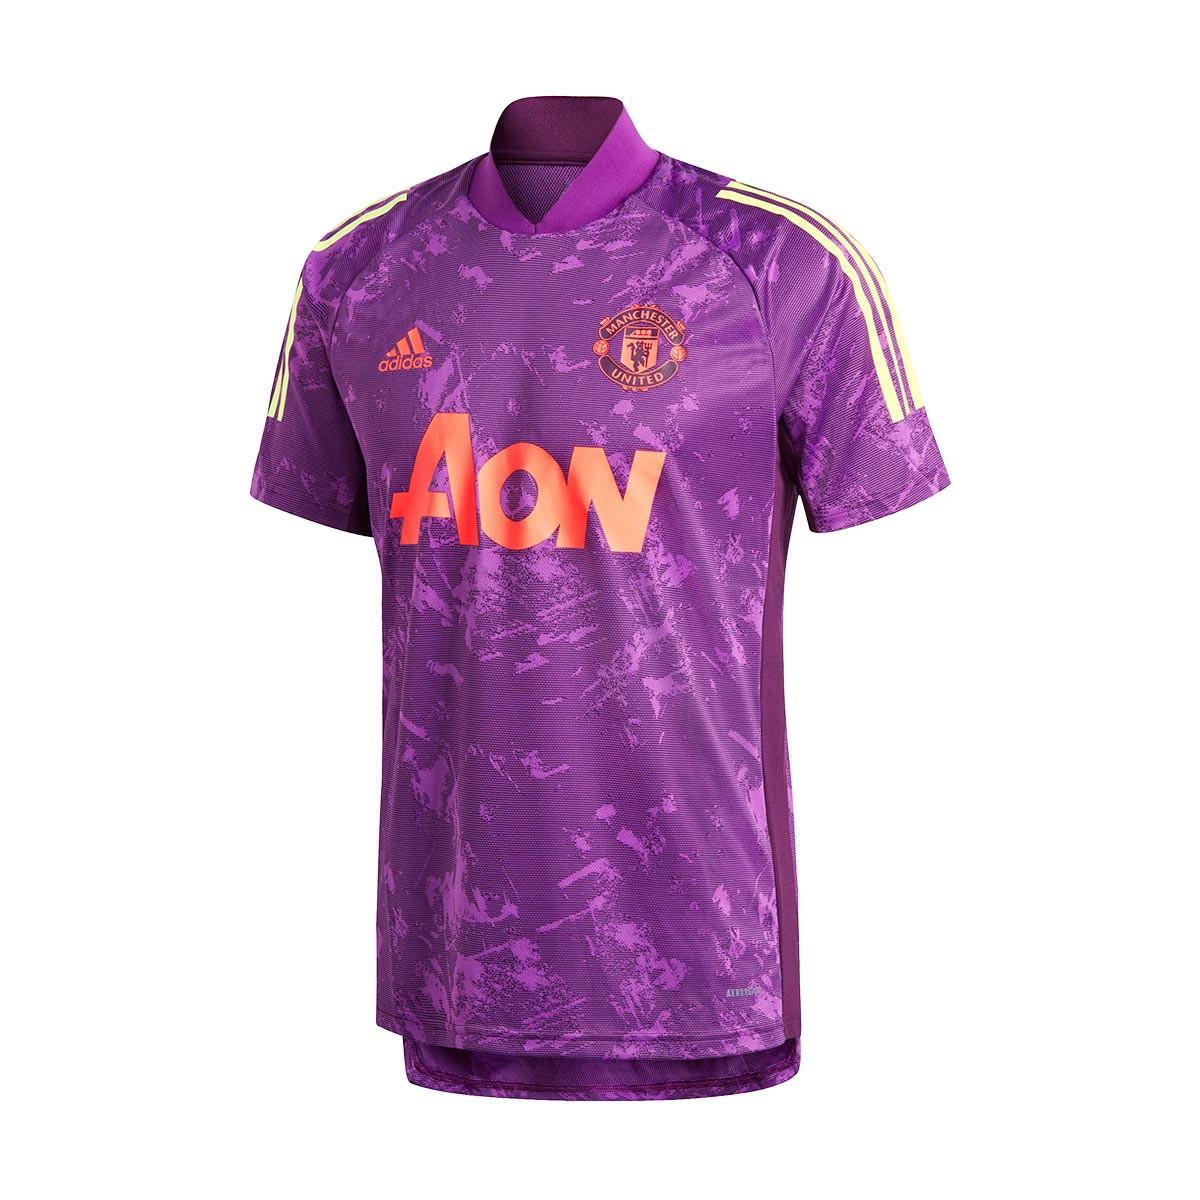 Jersey Adidas Manchester United Fc European Training 2020 2021 Glory Purple Football Store Futbol Emotion